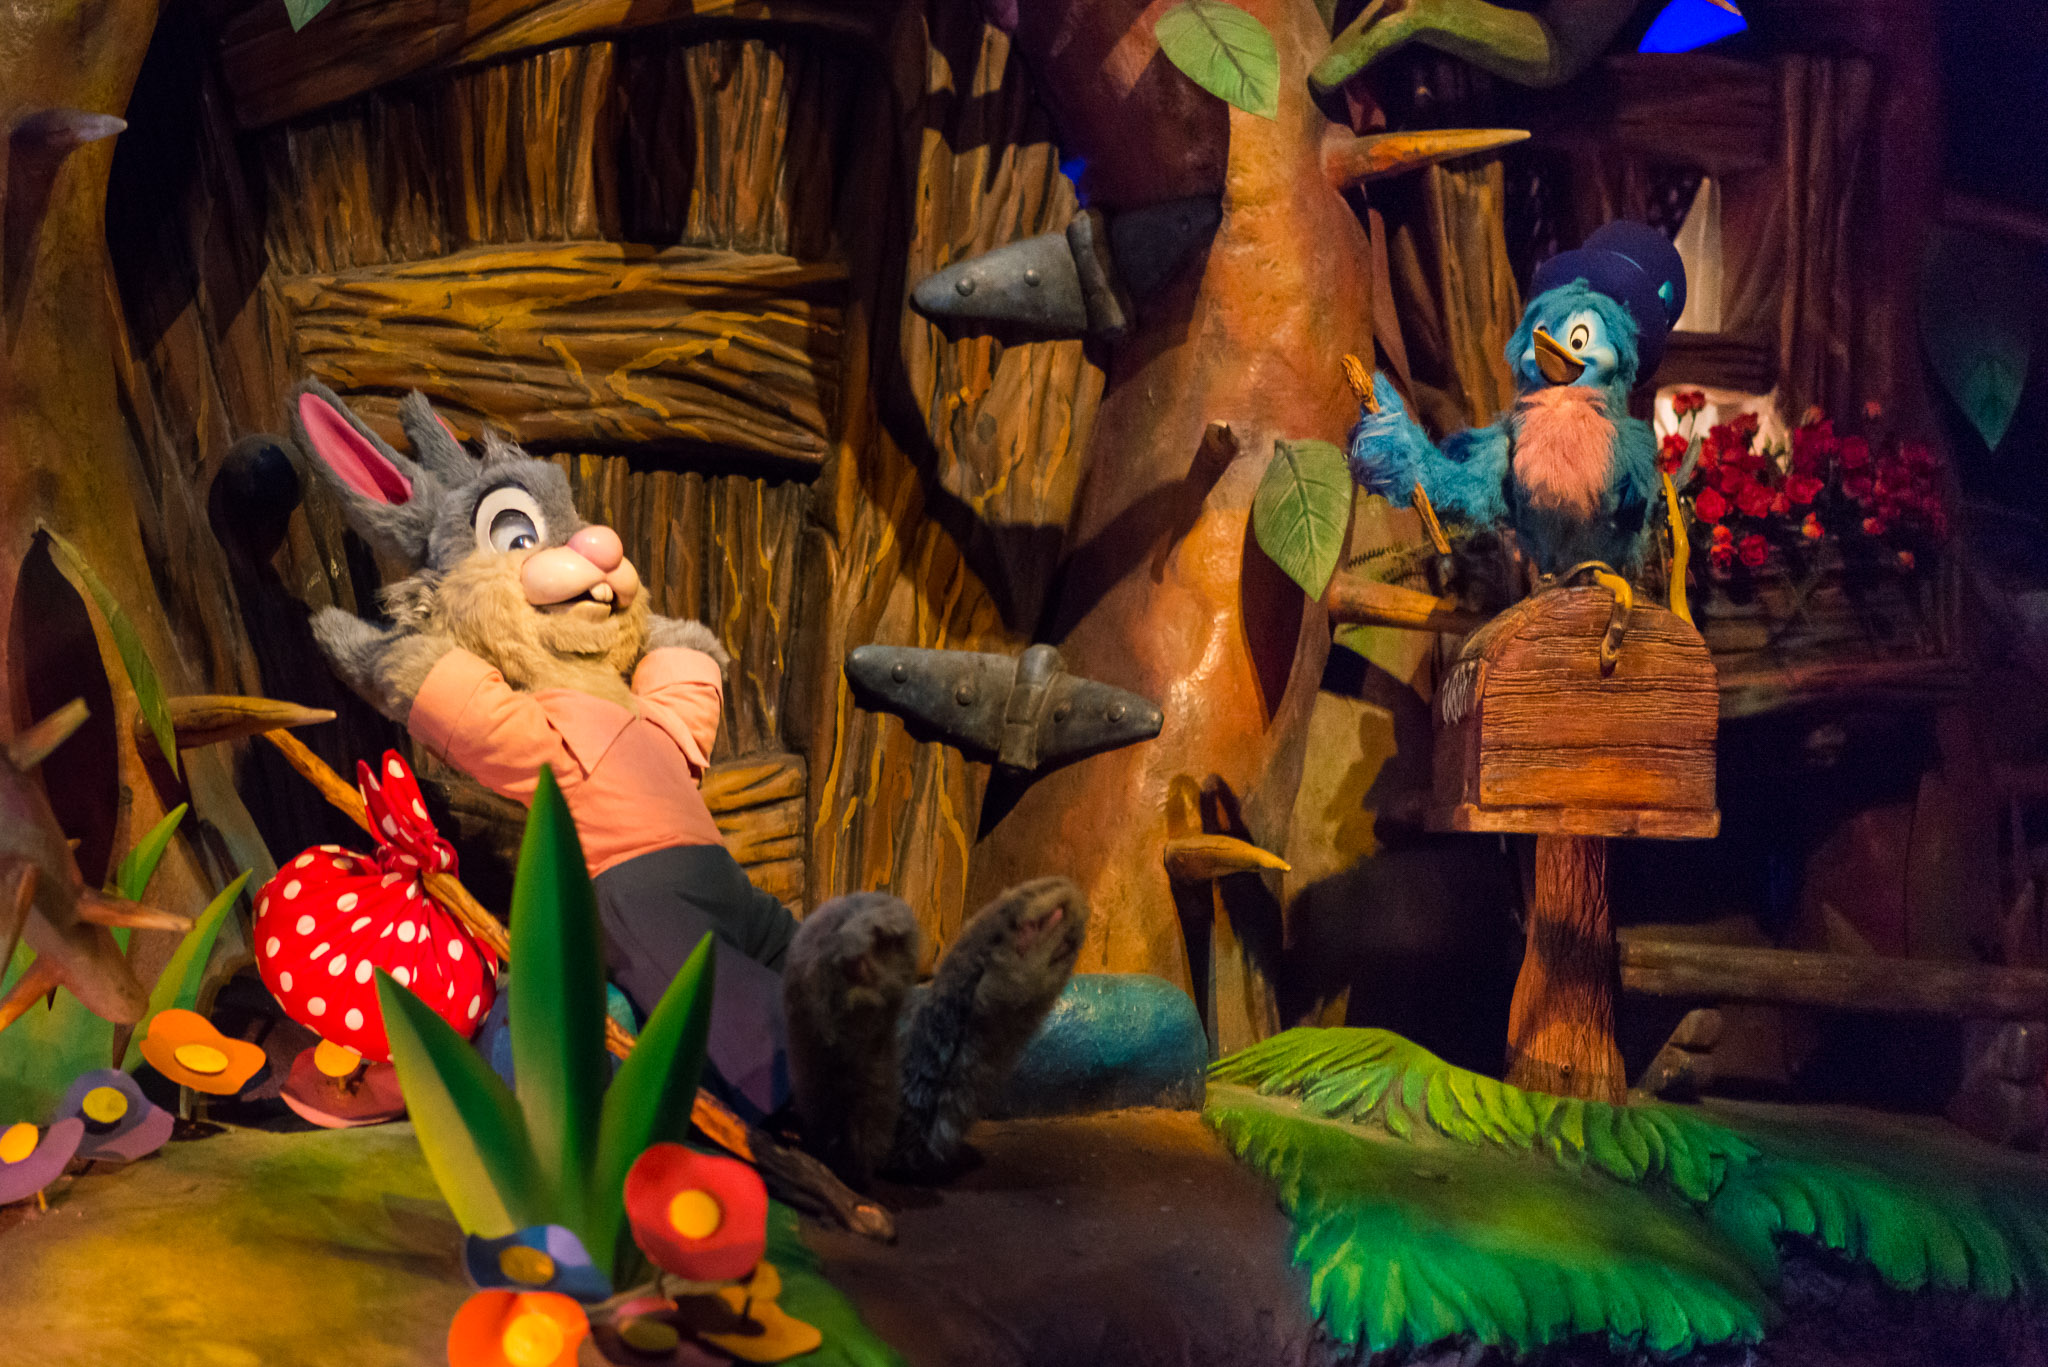 Brer Rabbit Relax - Walt Disney World Magic Kingdom